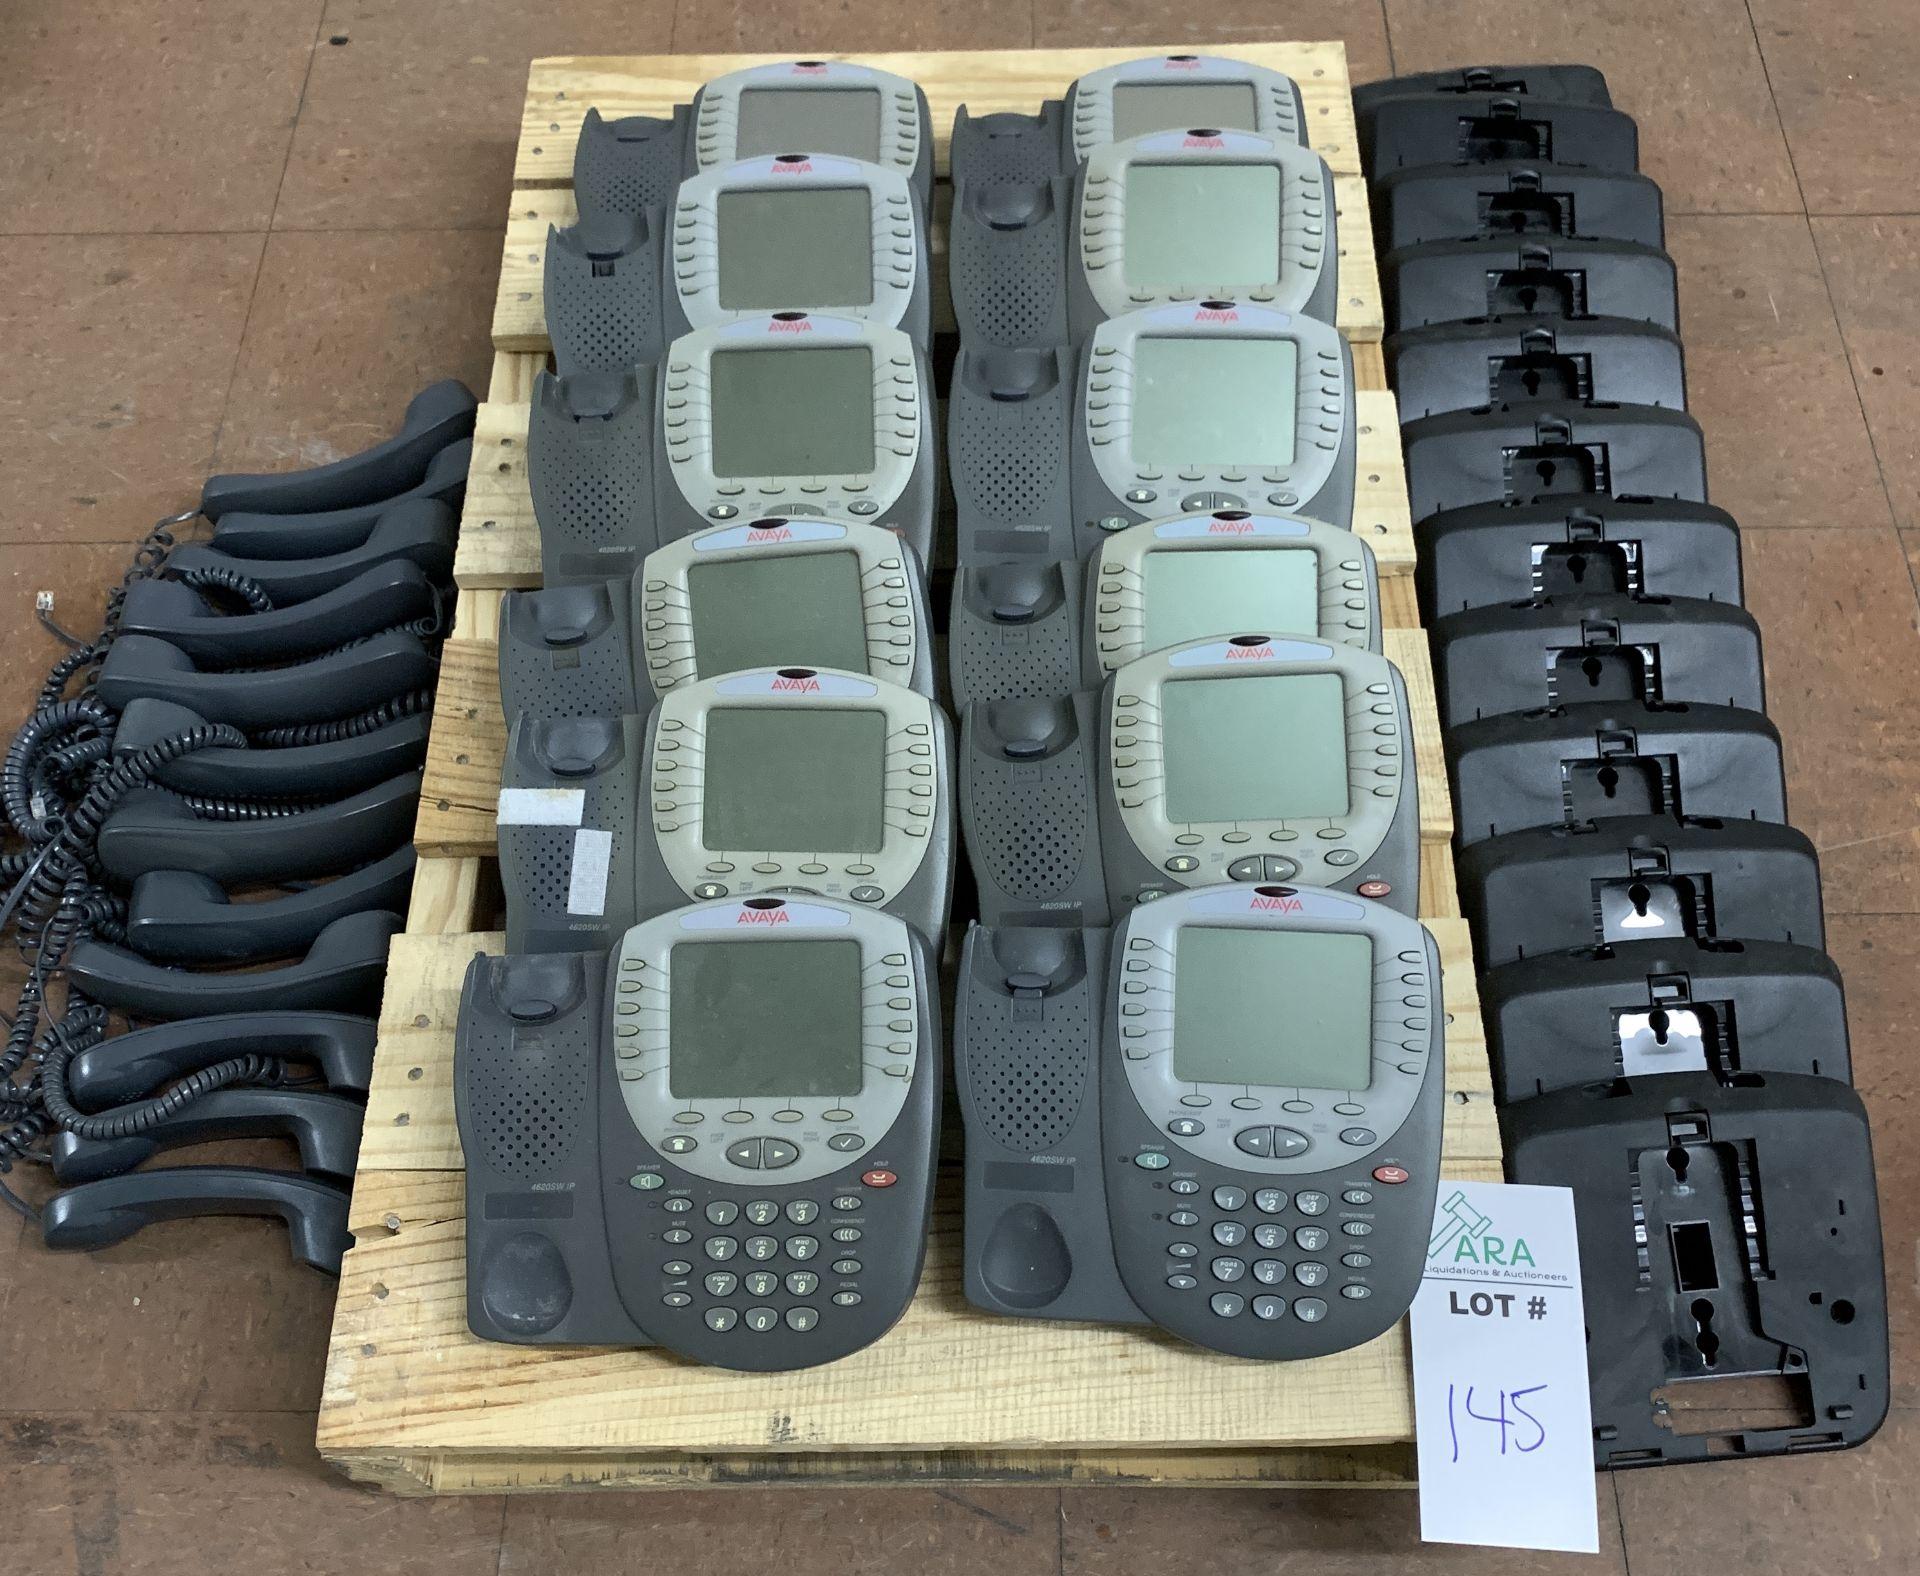 Lot 145 - 12 AVAYA PHONE HANDSETS, MODEL 4620SW IP